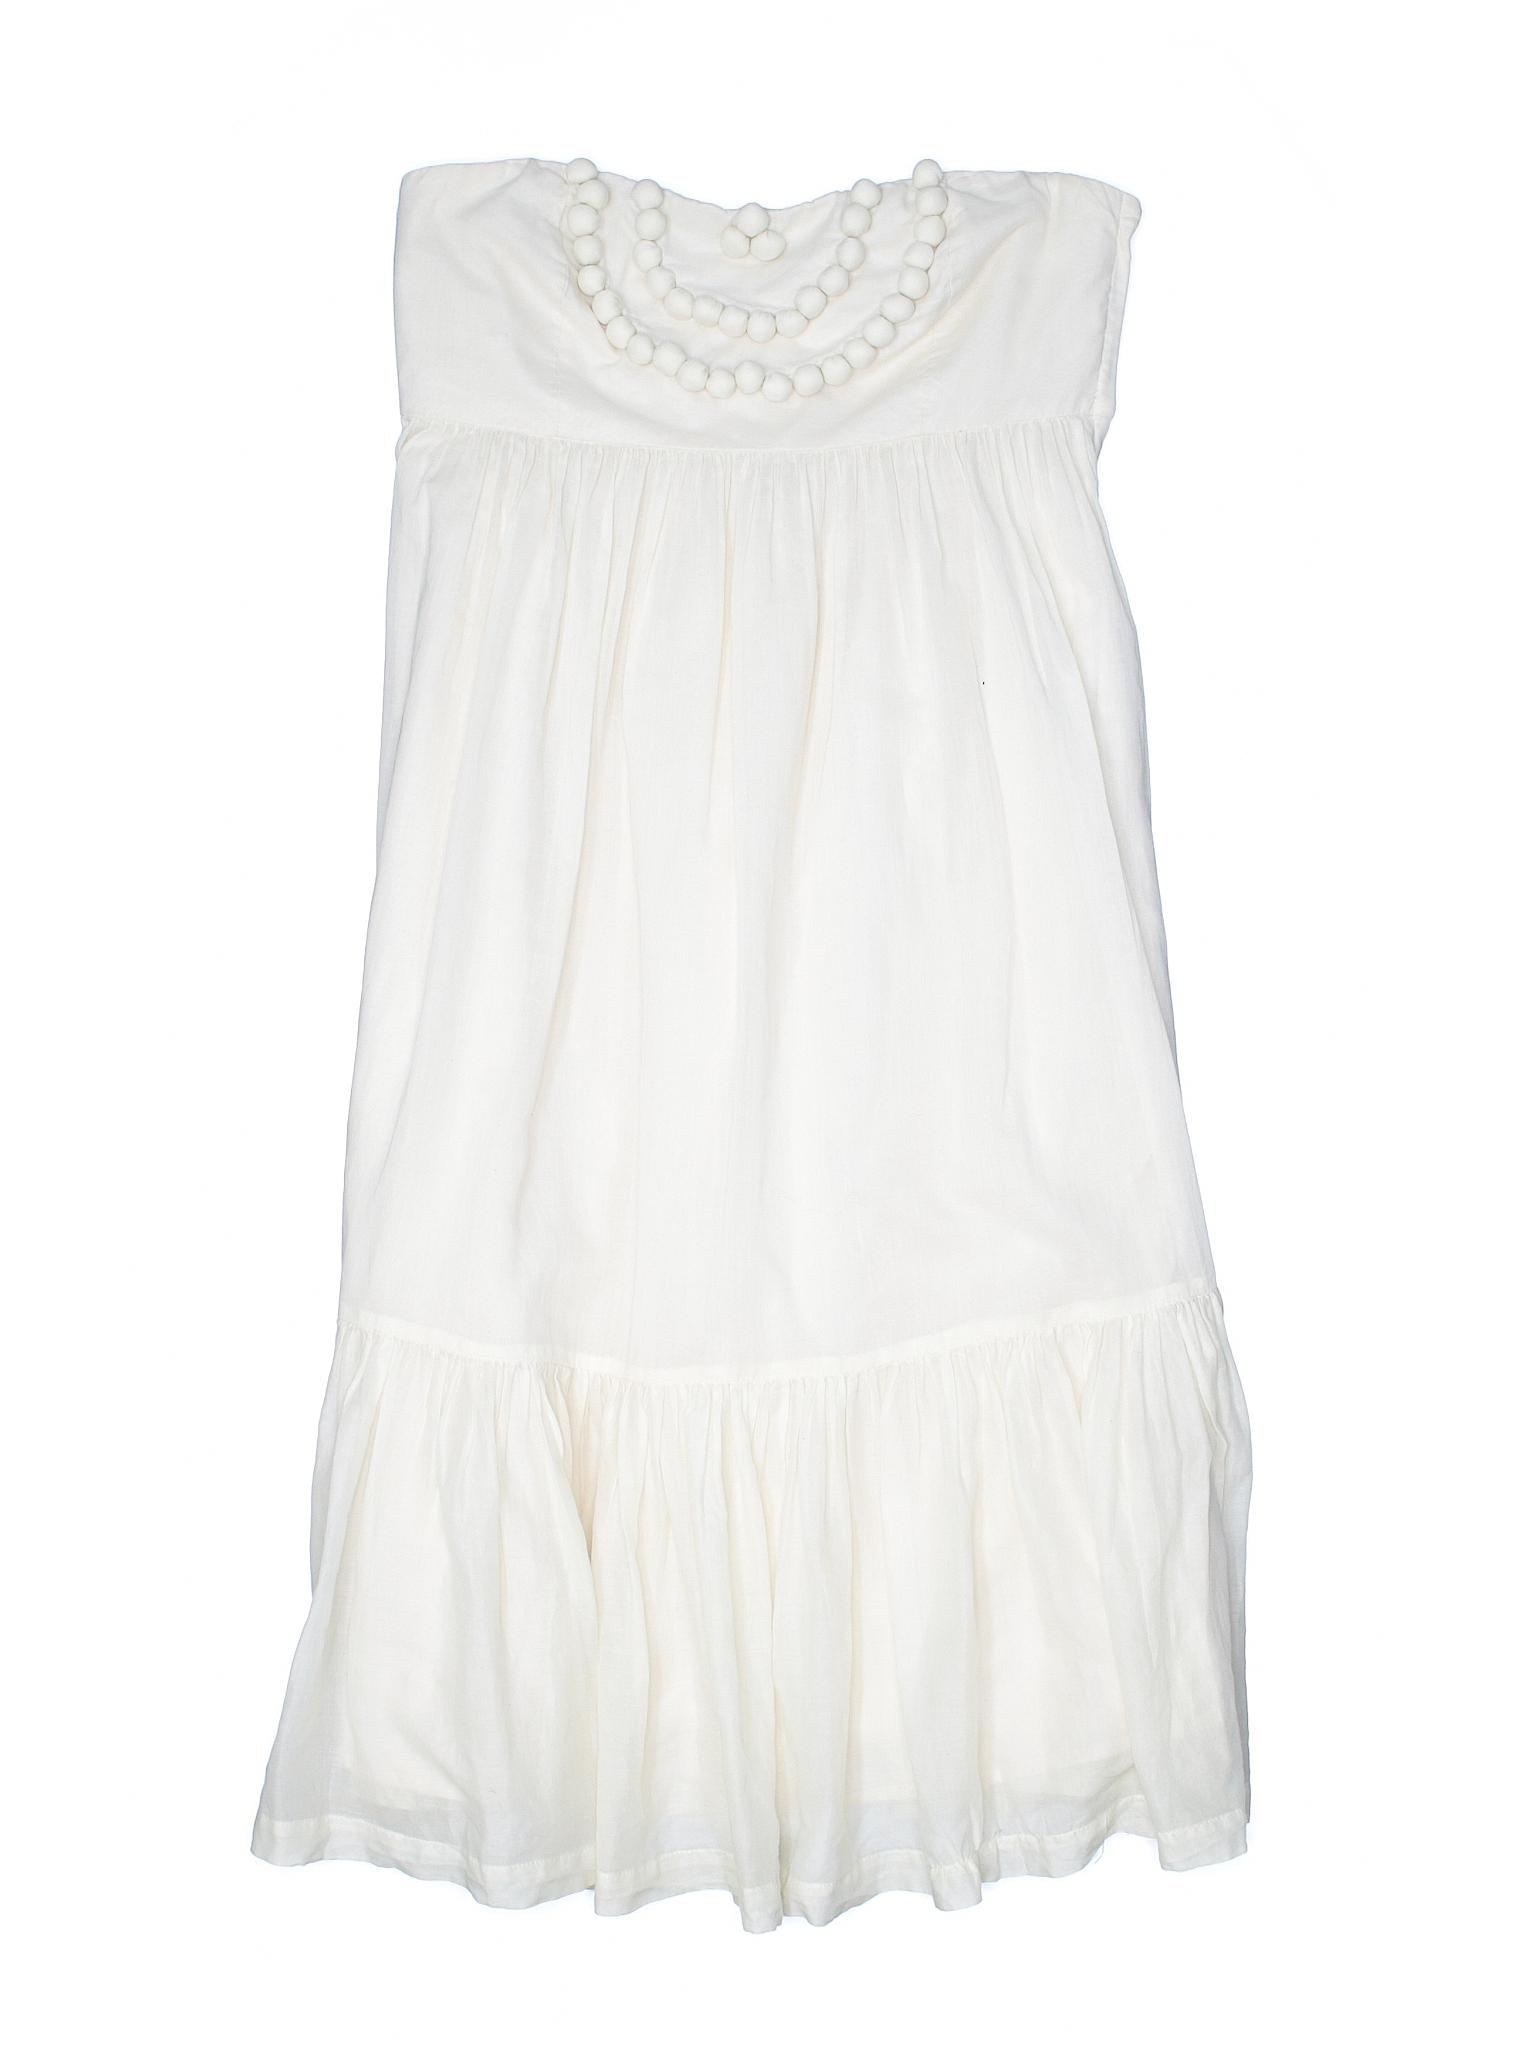 8582e0f8417 Casual Dress | Products | Dresses, 15 dresses, Dress outfits